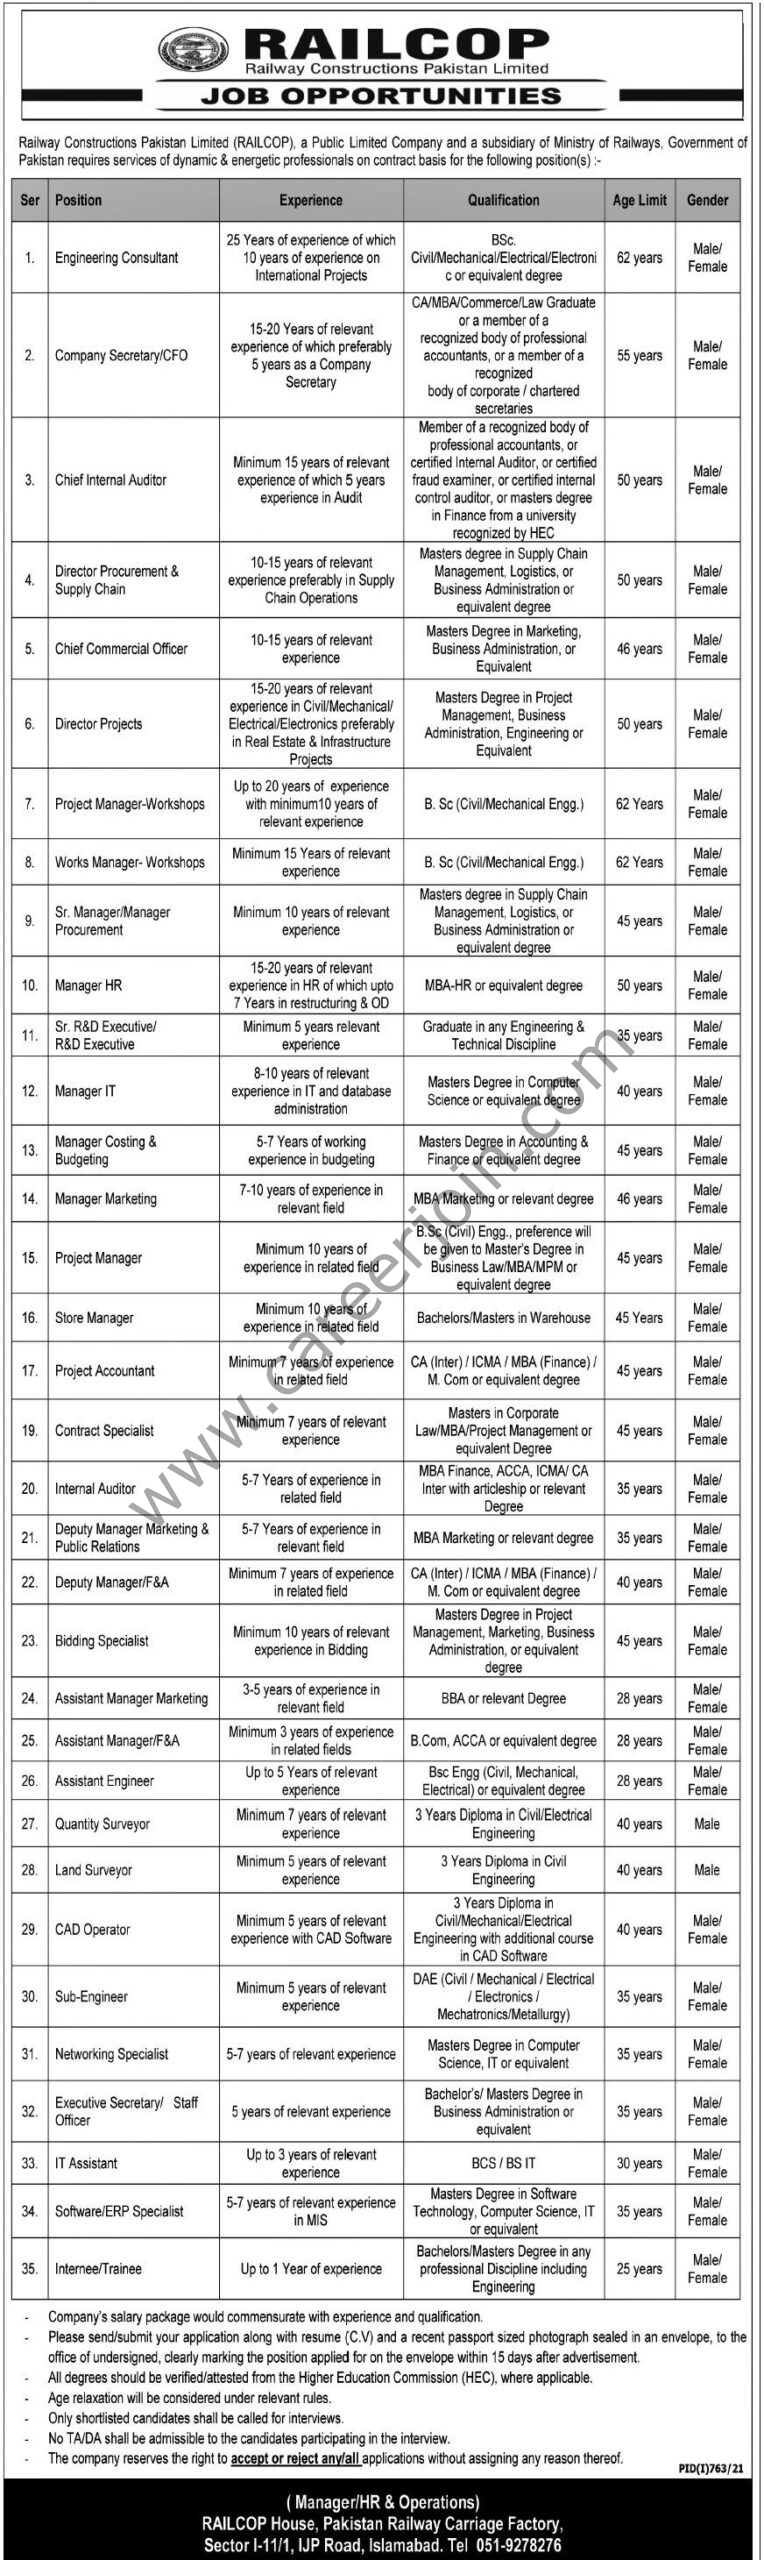 Railway Constructions Pakistan Ltd RAILCOP Jobs August 2021